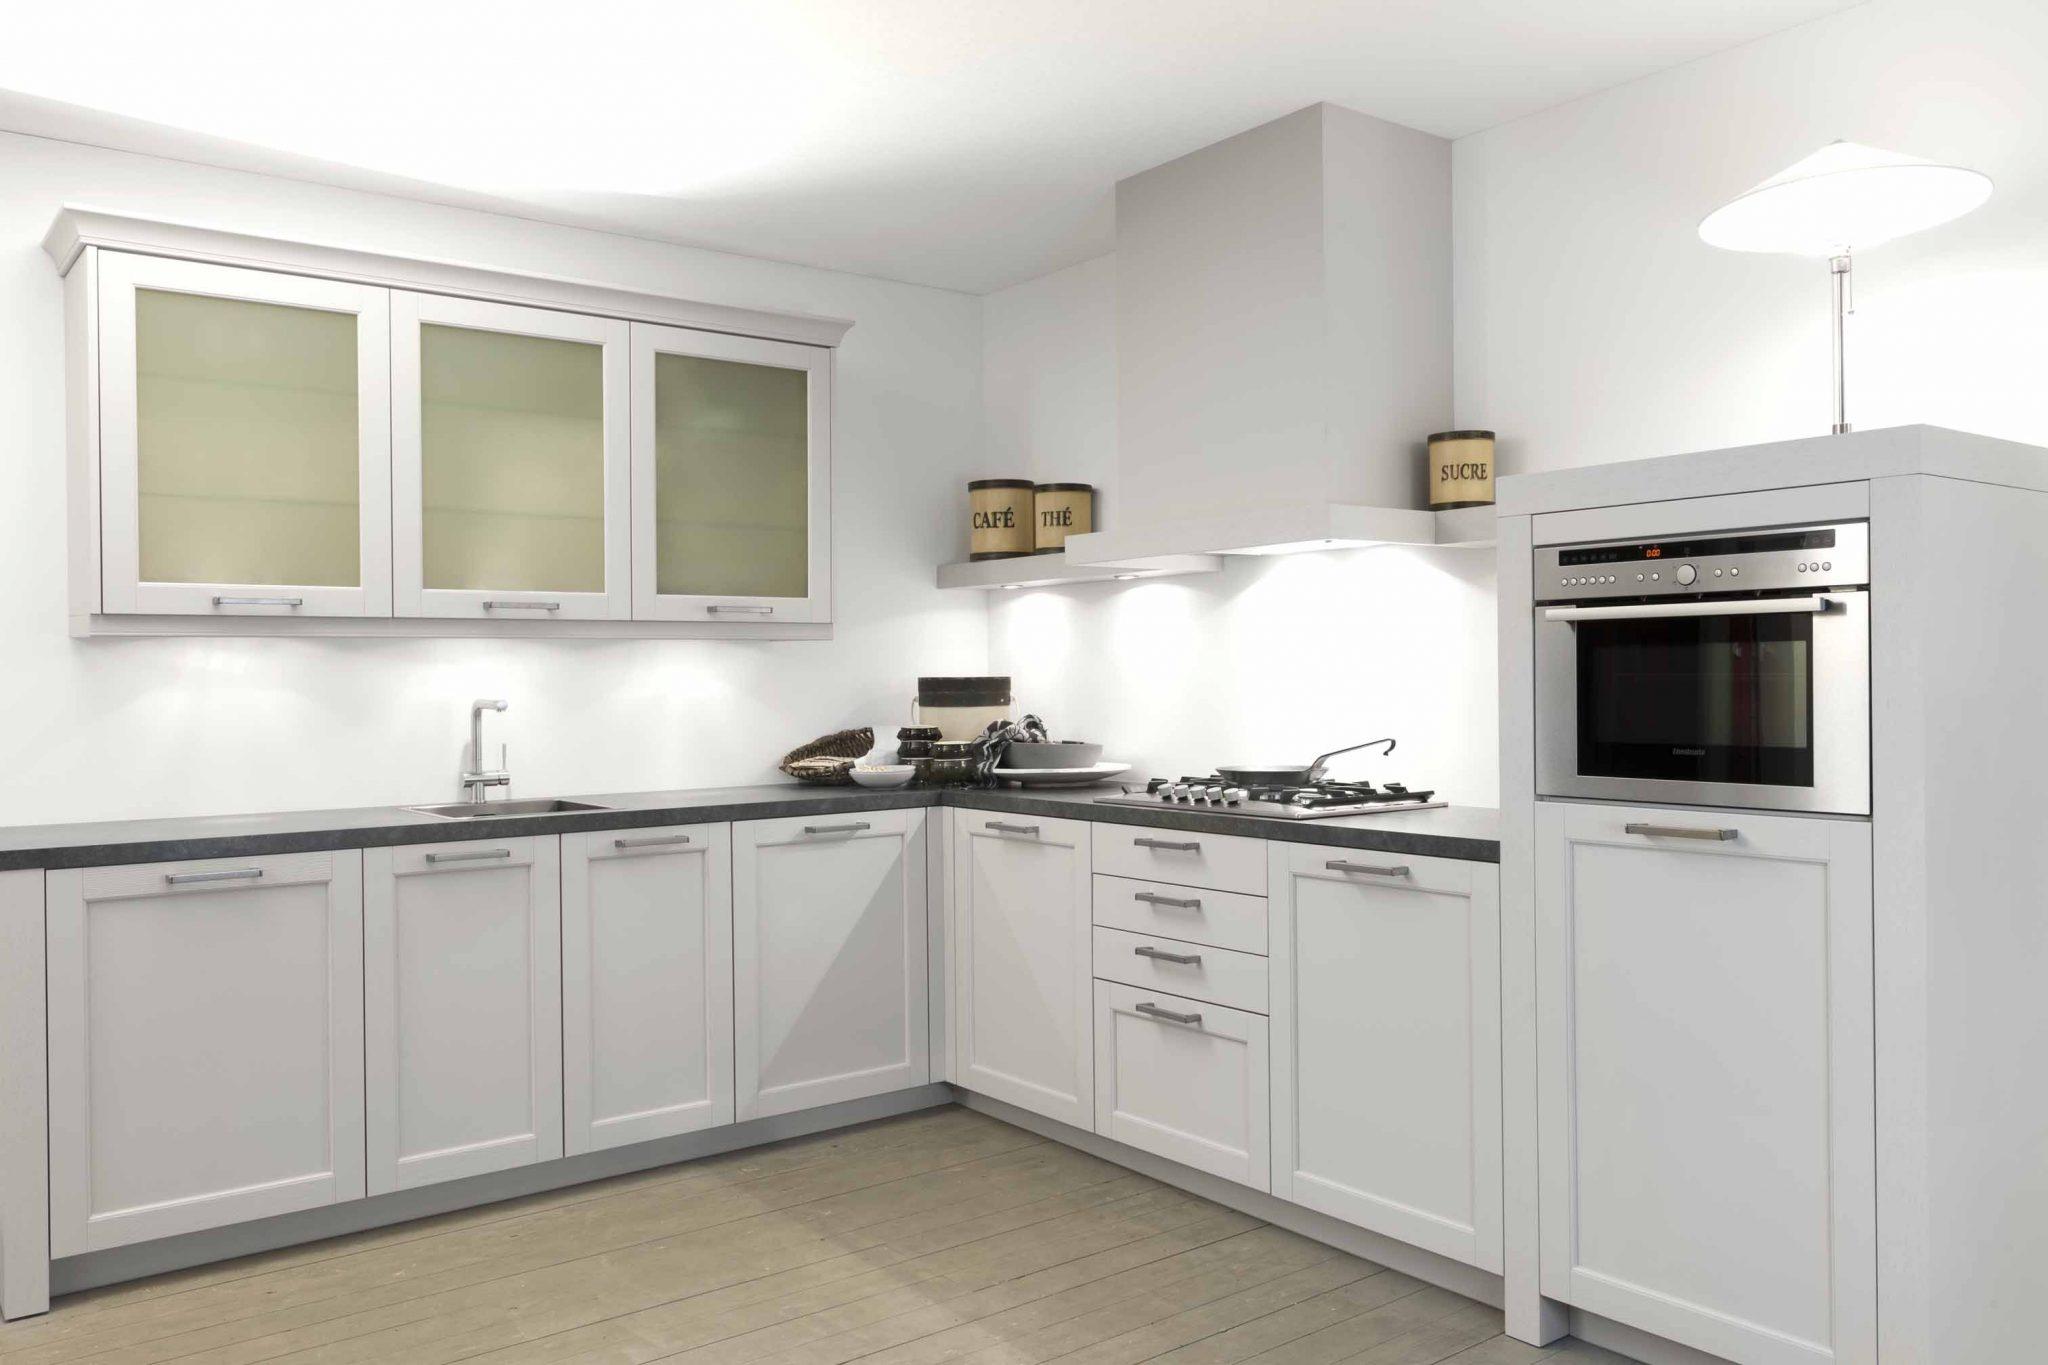 Massief Houten Keuken : Hoekkeuken massief hout bkb keukens